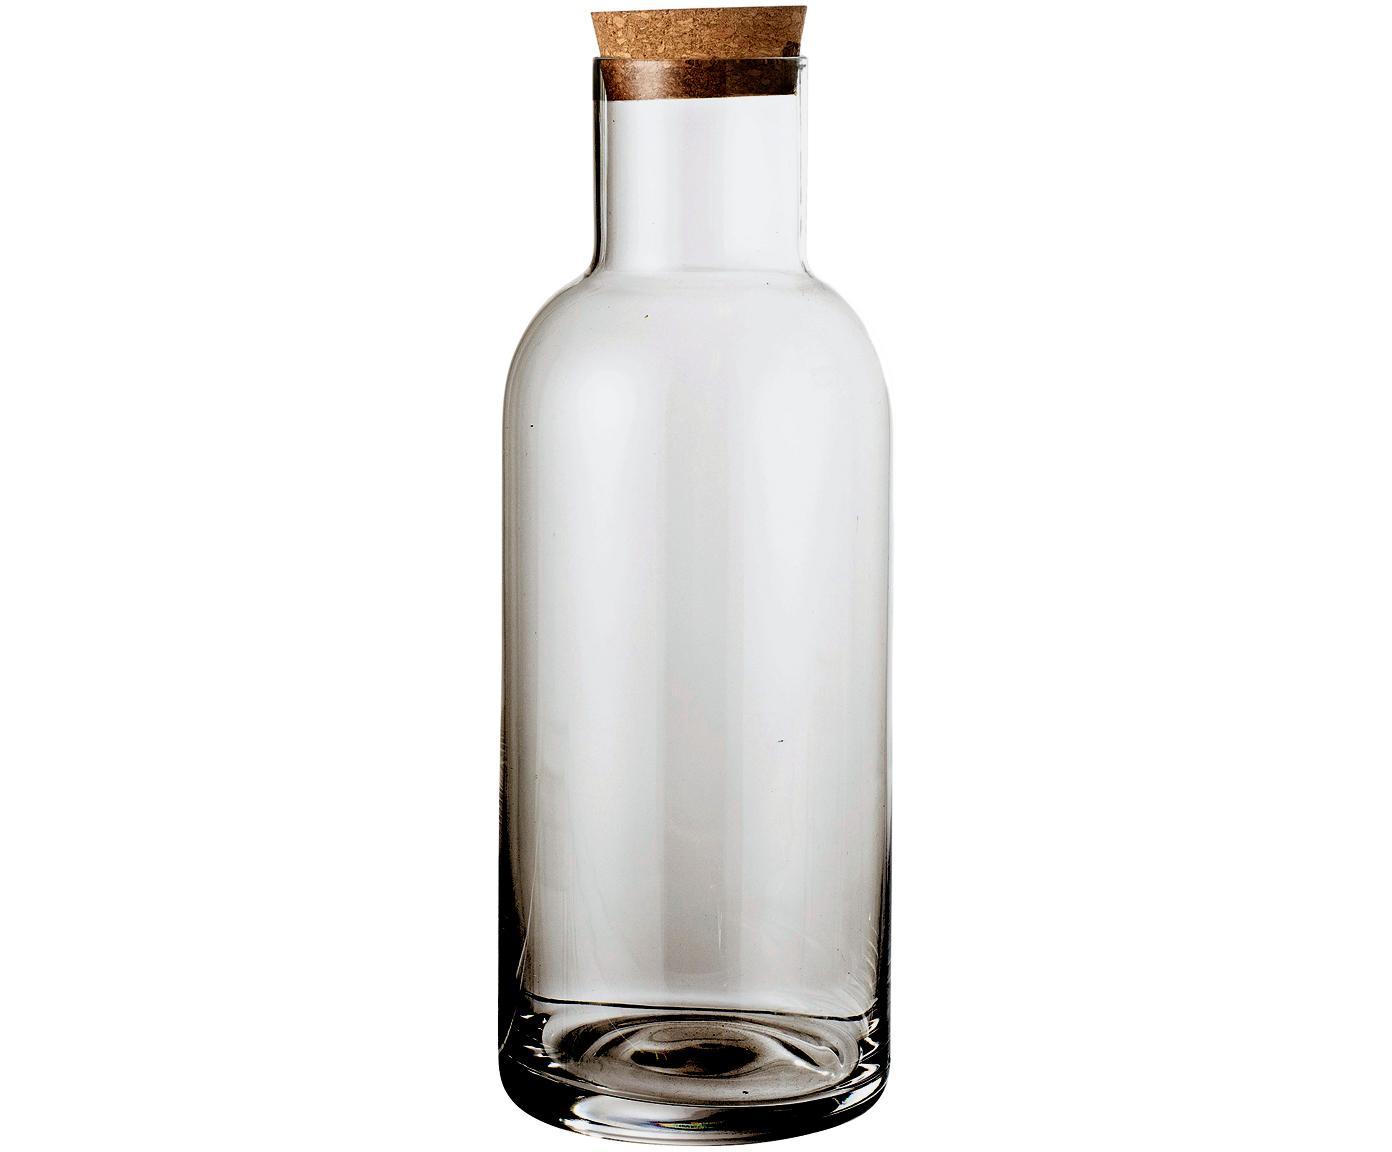 Karaf Clearance, Deksel: kurk, Grijs, transparant, 1 L